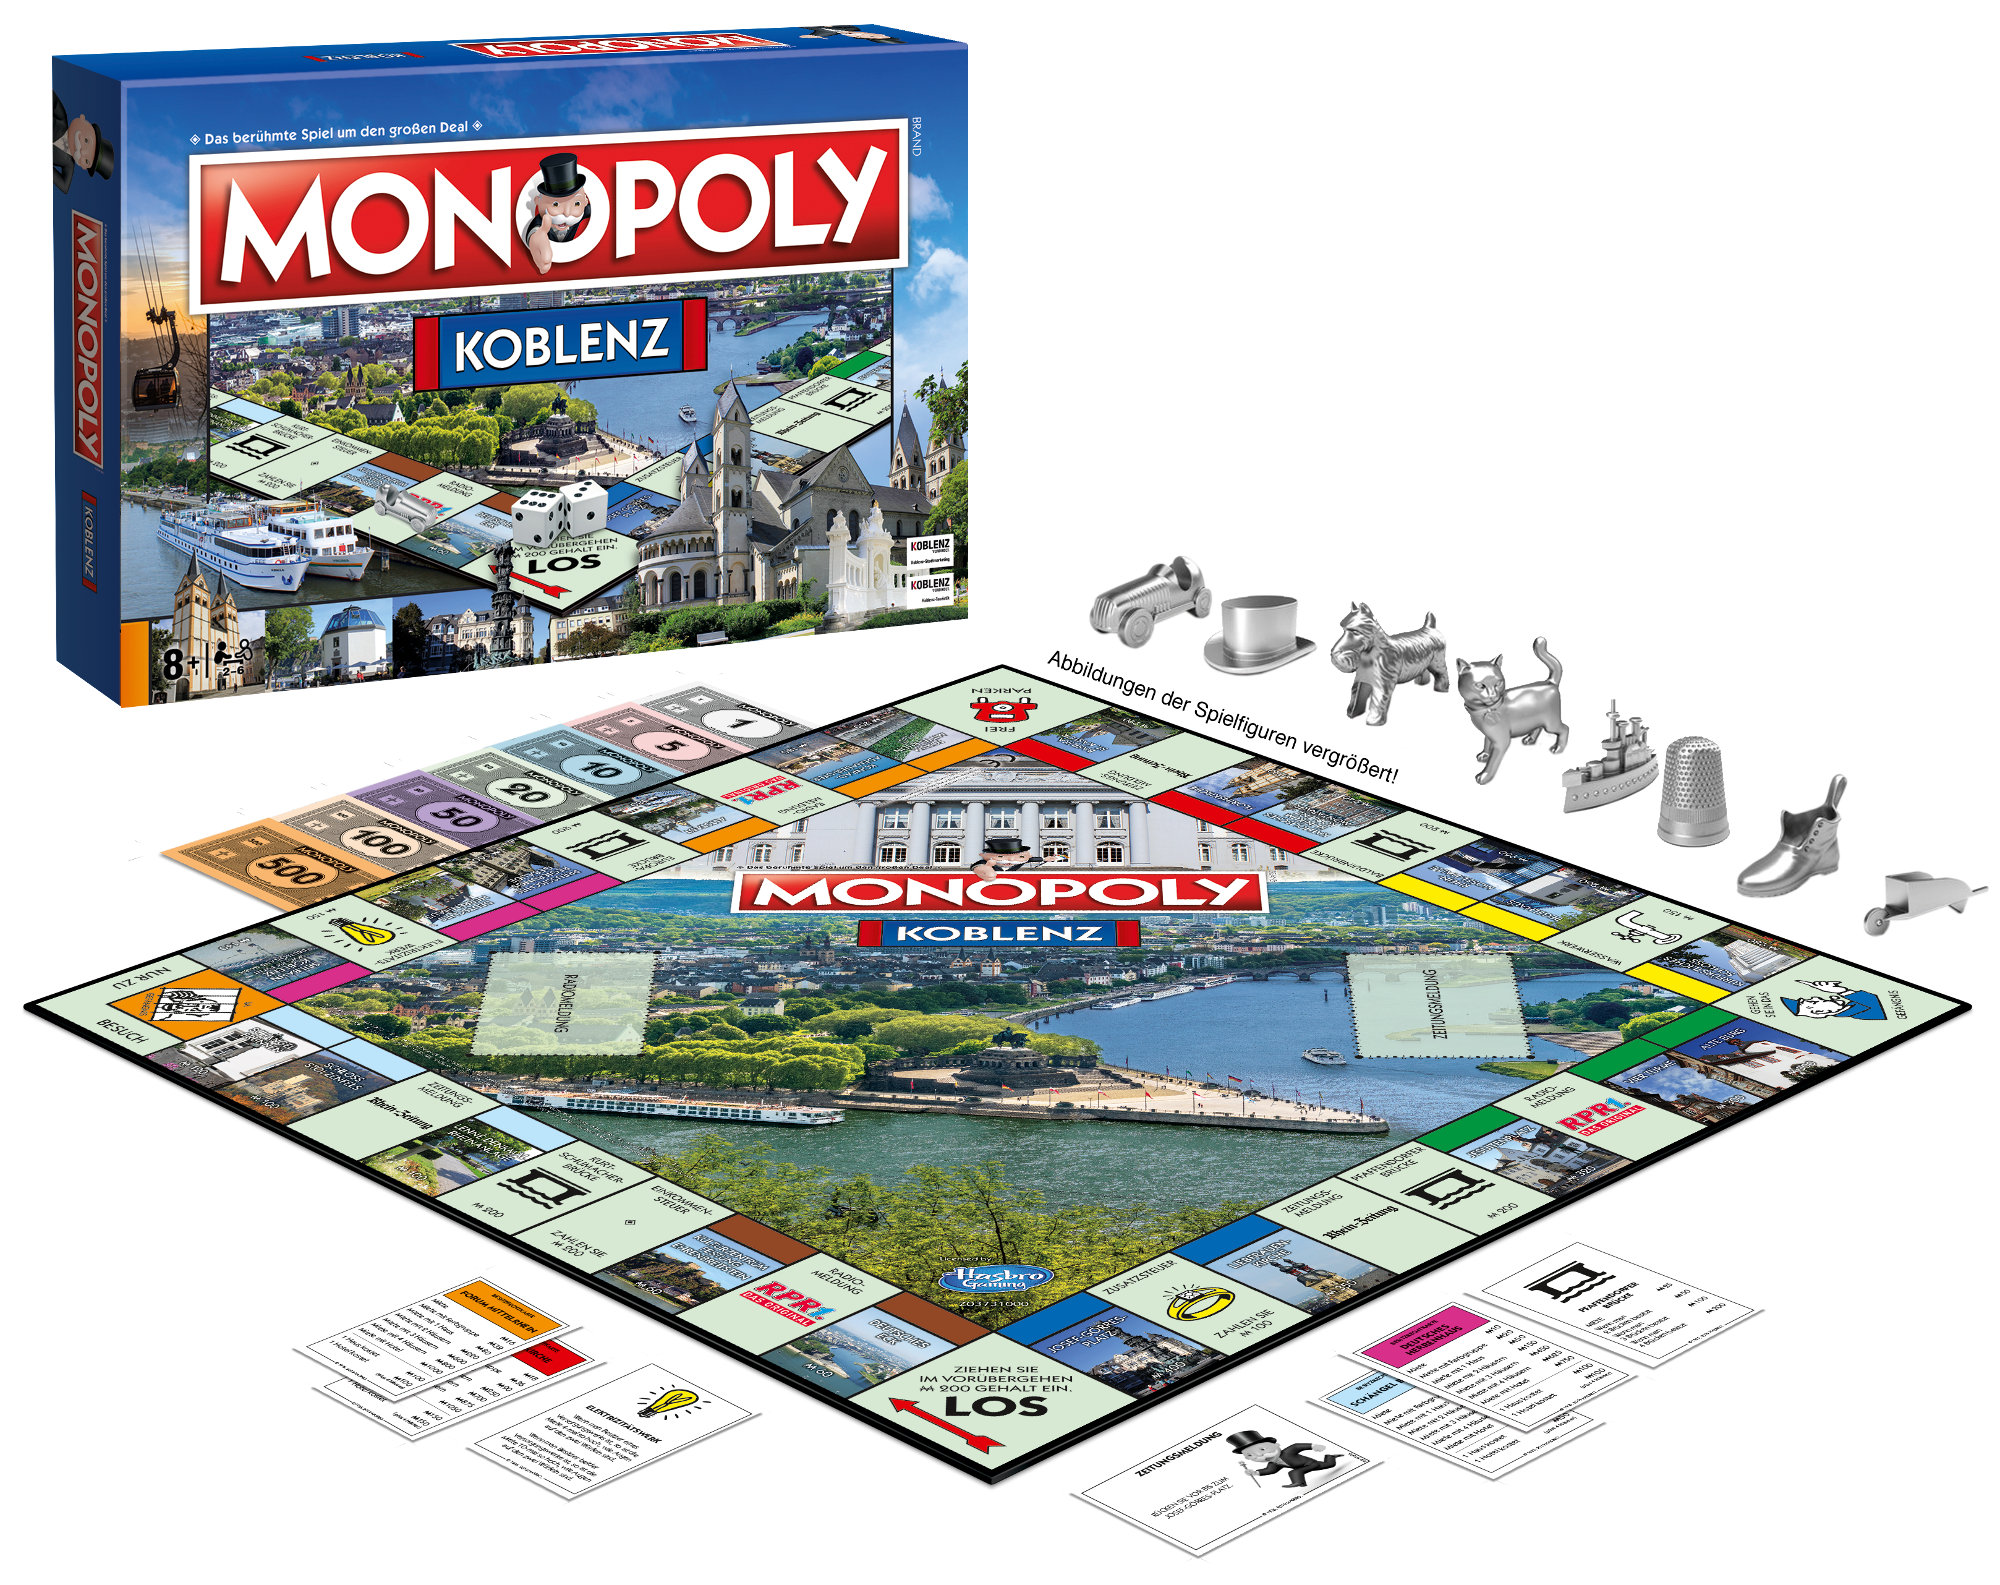 Monopoly Koblenz